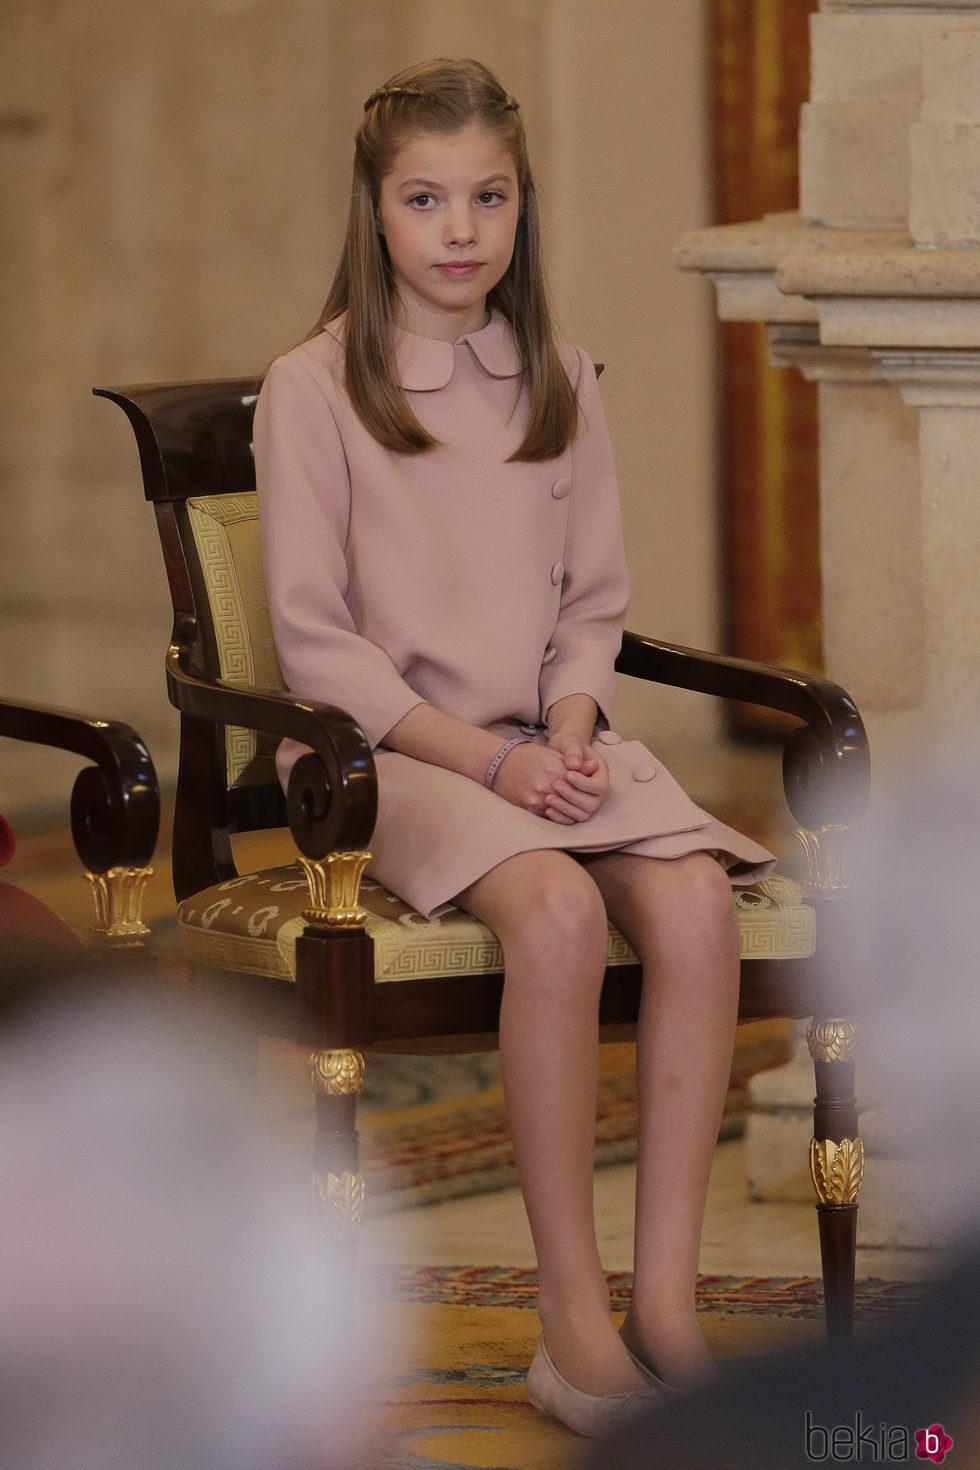 La Infanta Sofa en la entrega del Toisn de Oro a la